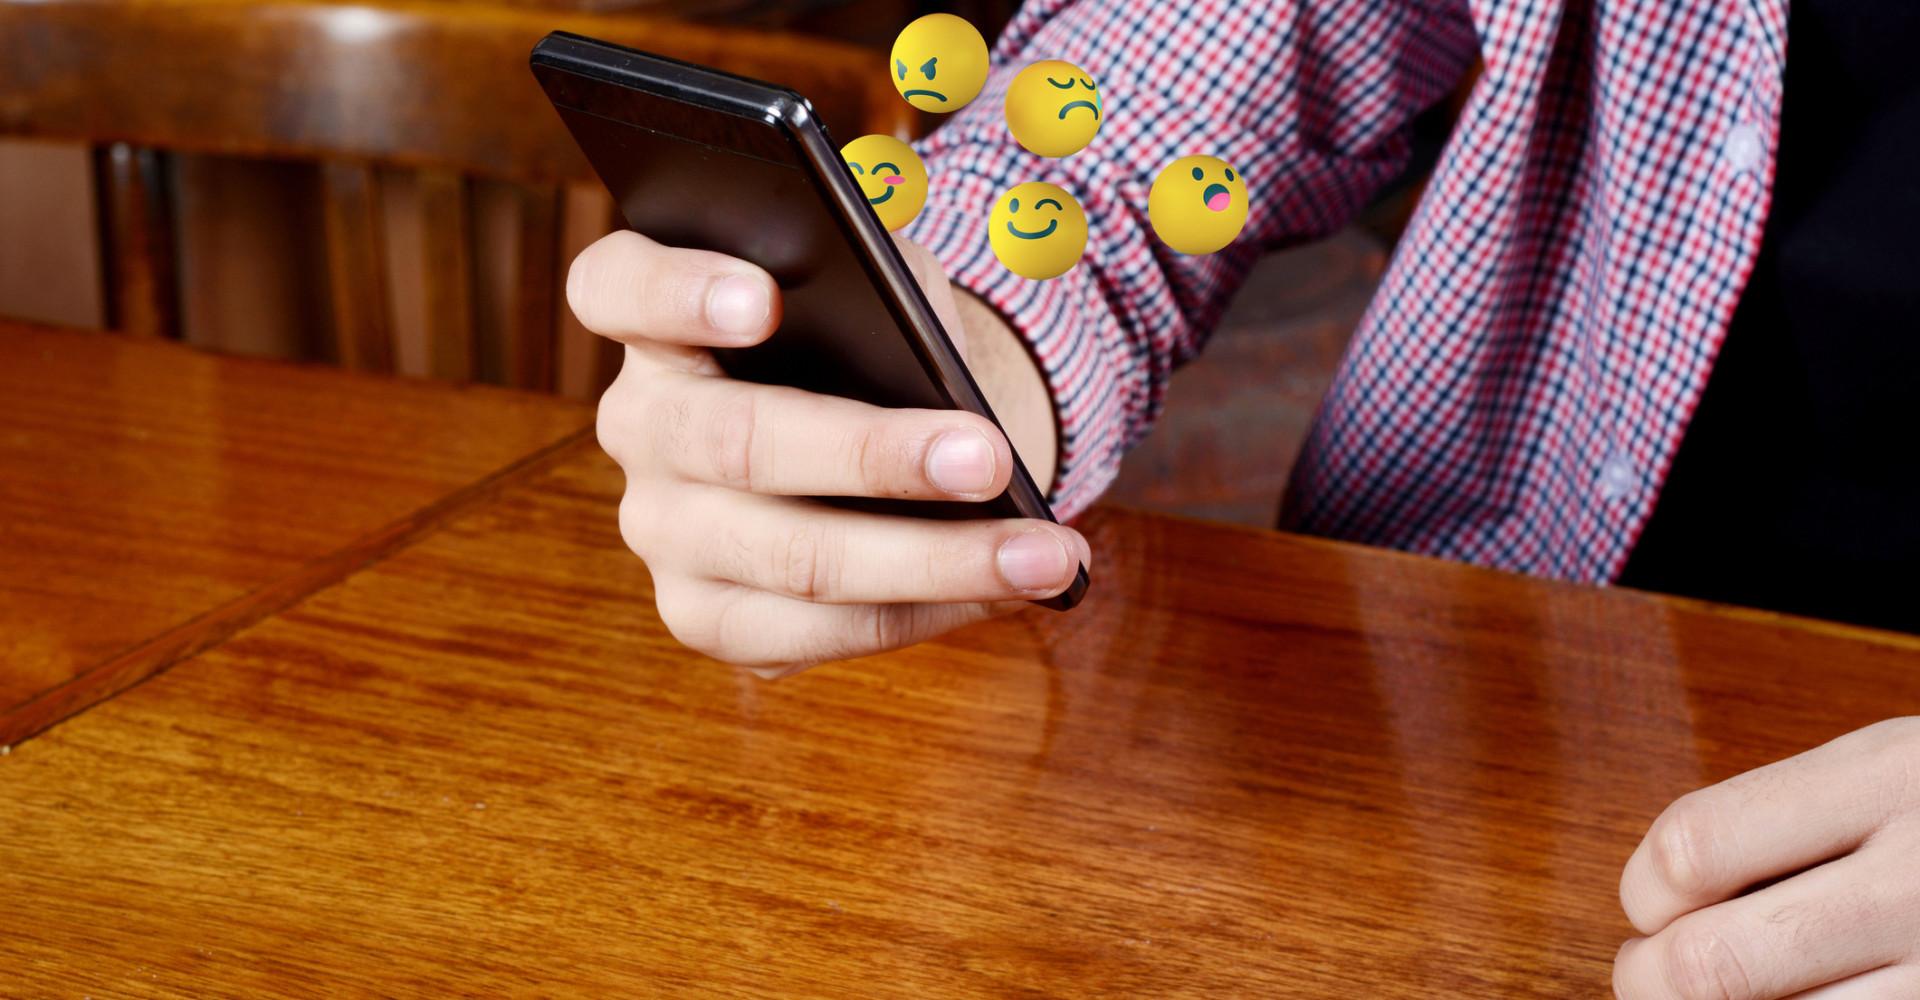 The lobster emoji is getting a digital makeover